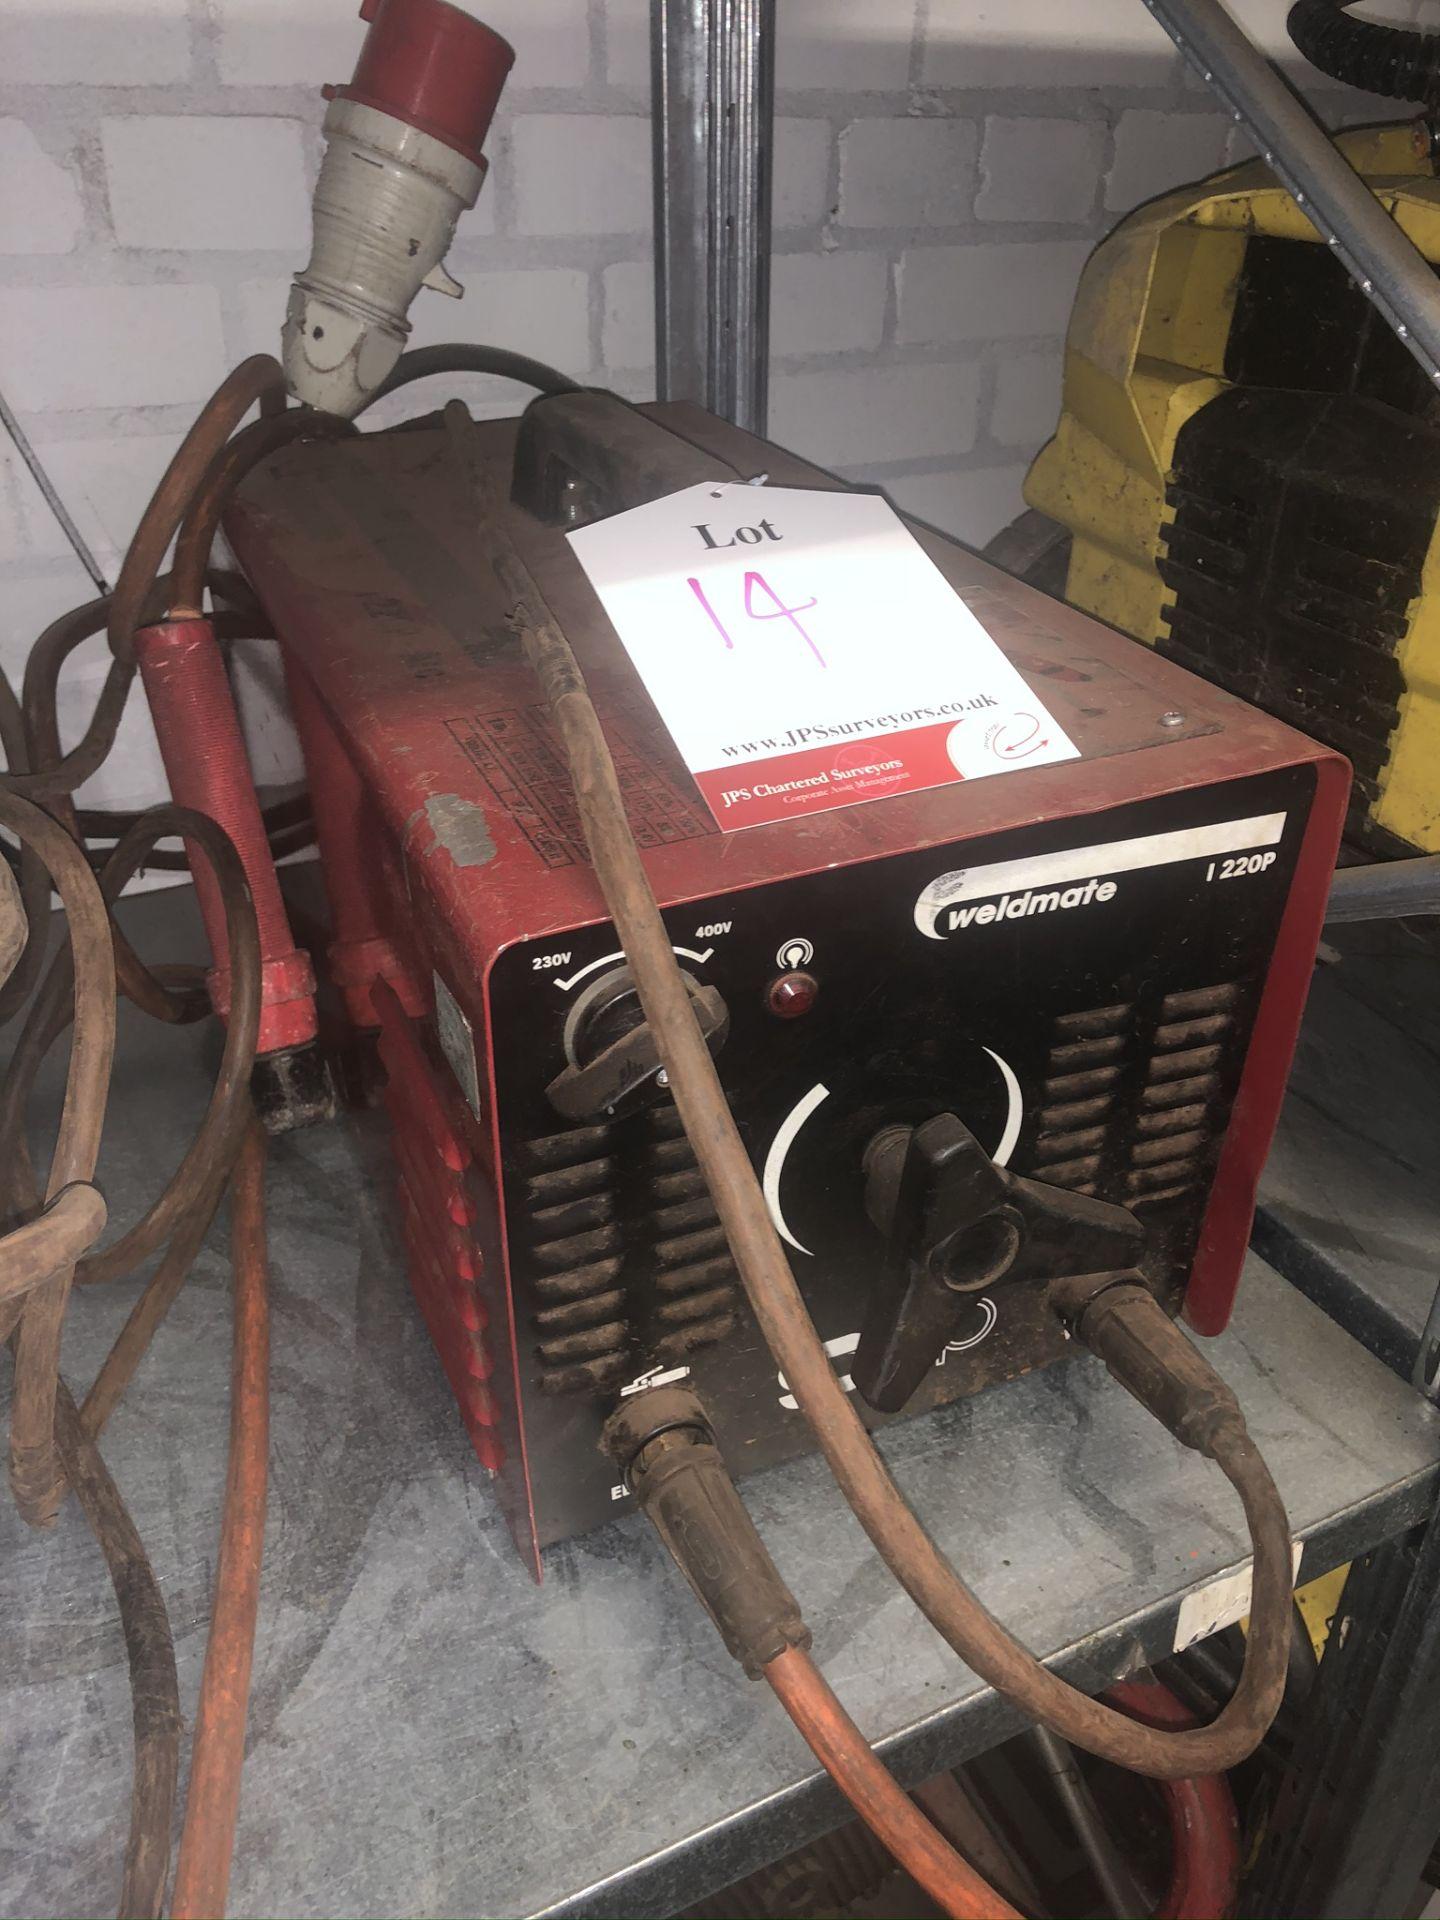 Lot 14 - SIP Weldmate 220p Inverter Welder